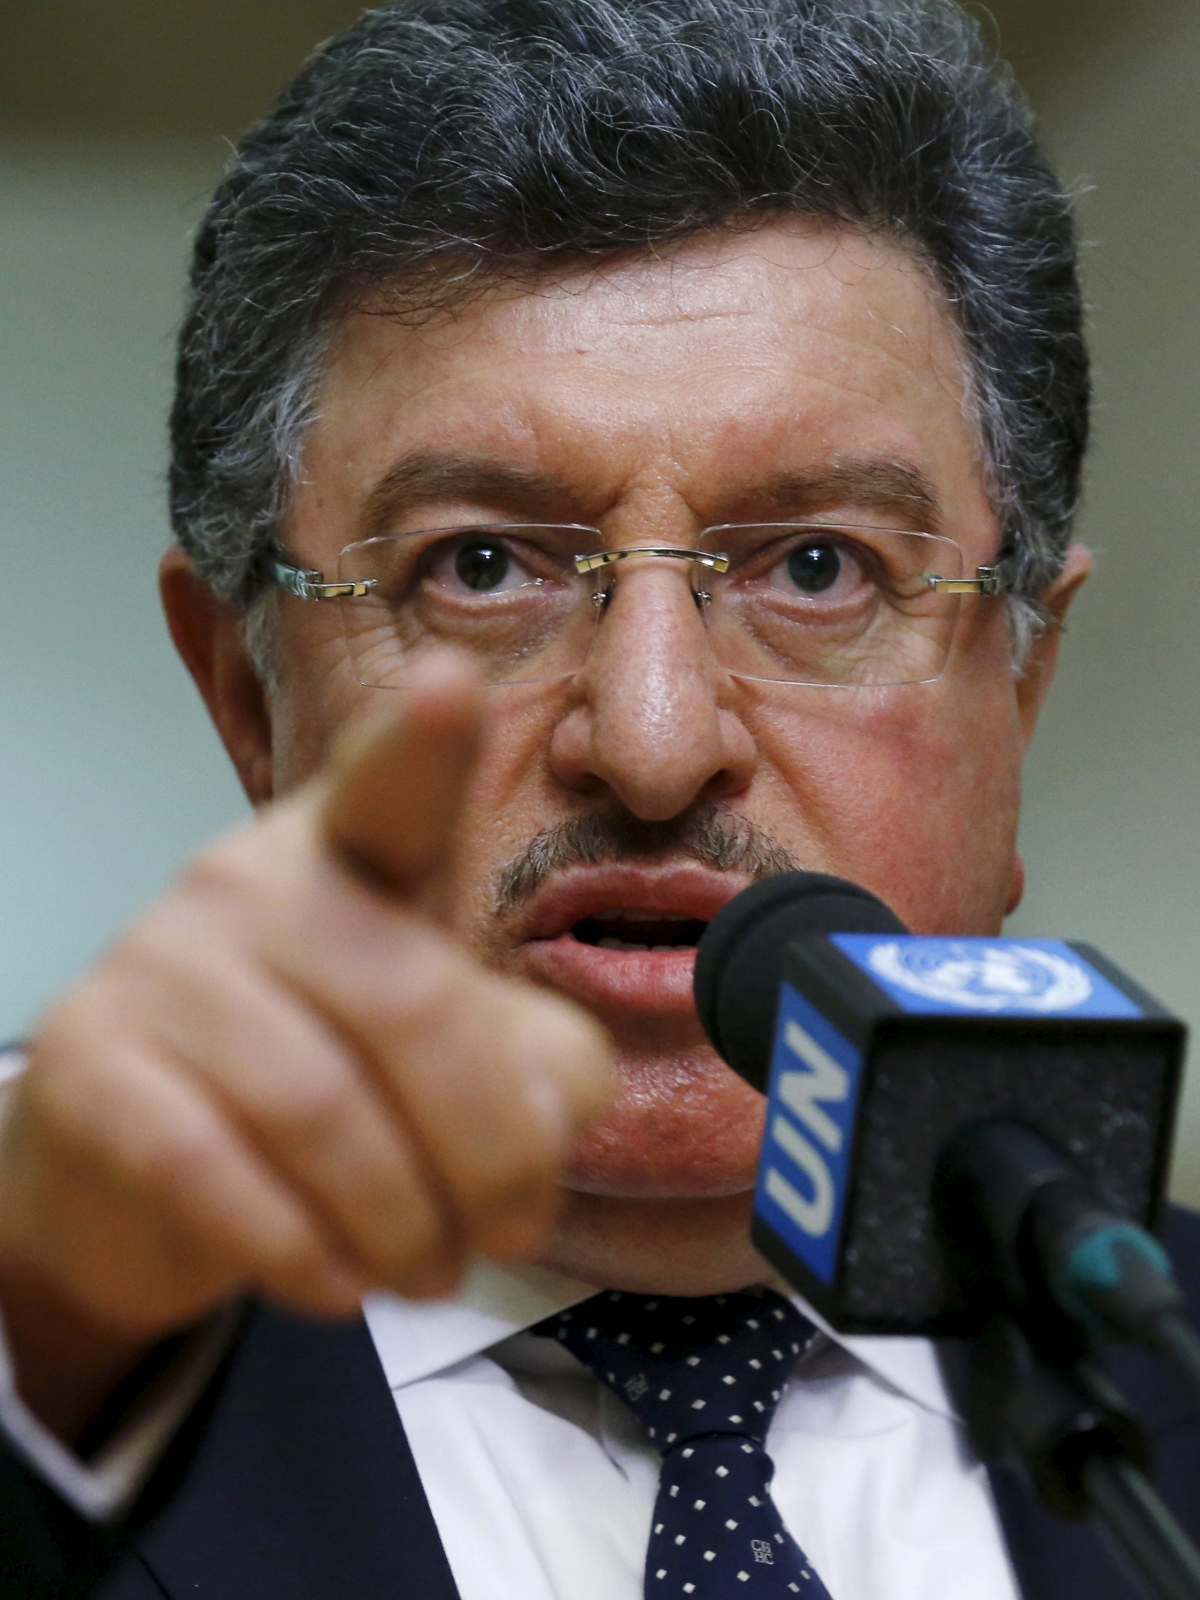 spokesman for the man Syrian opposition Salem al-Mislet